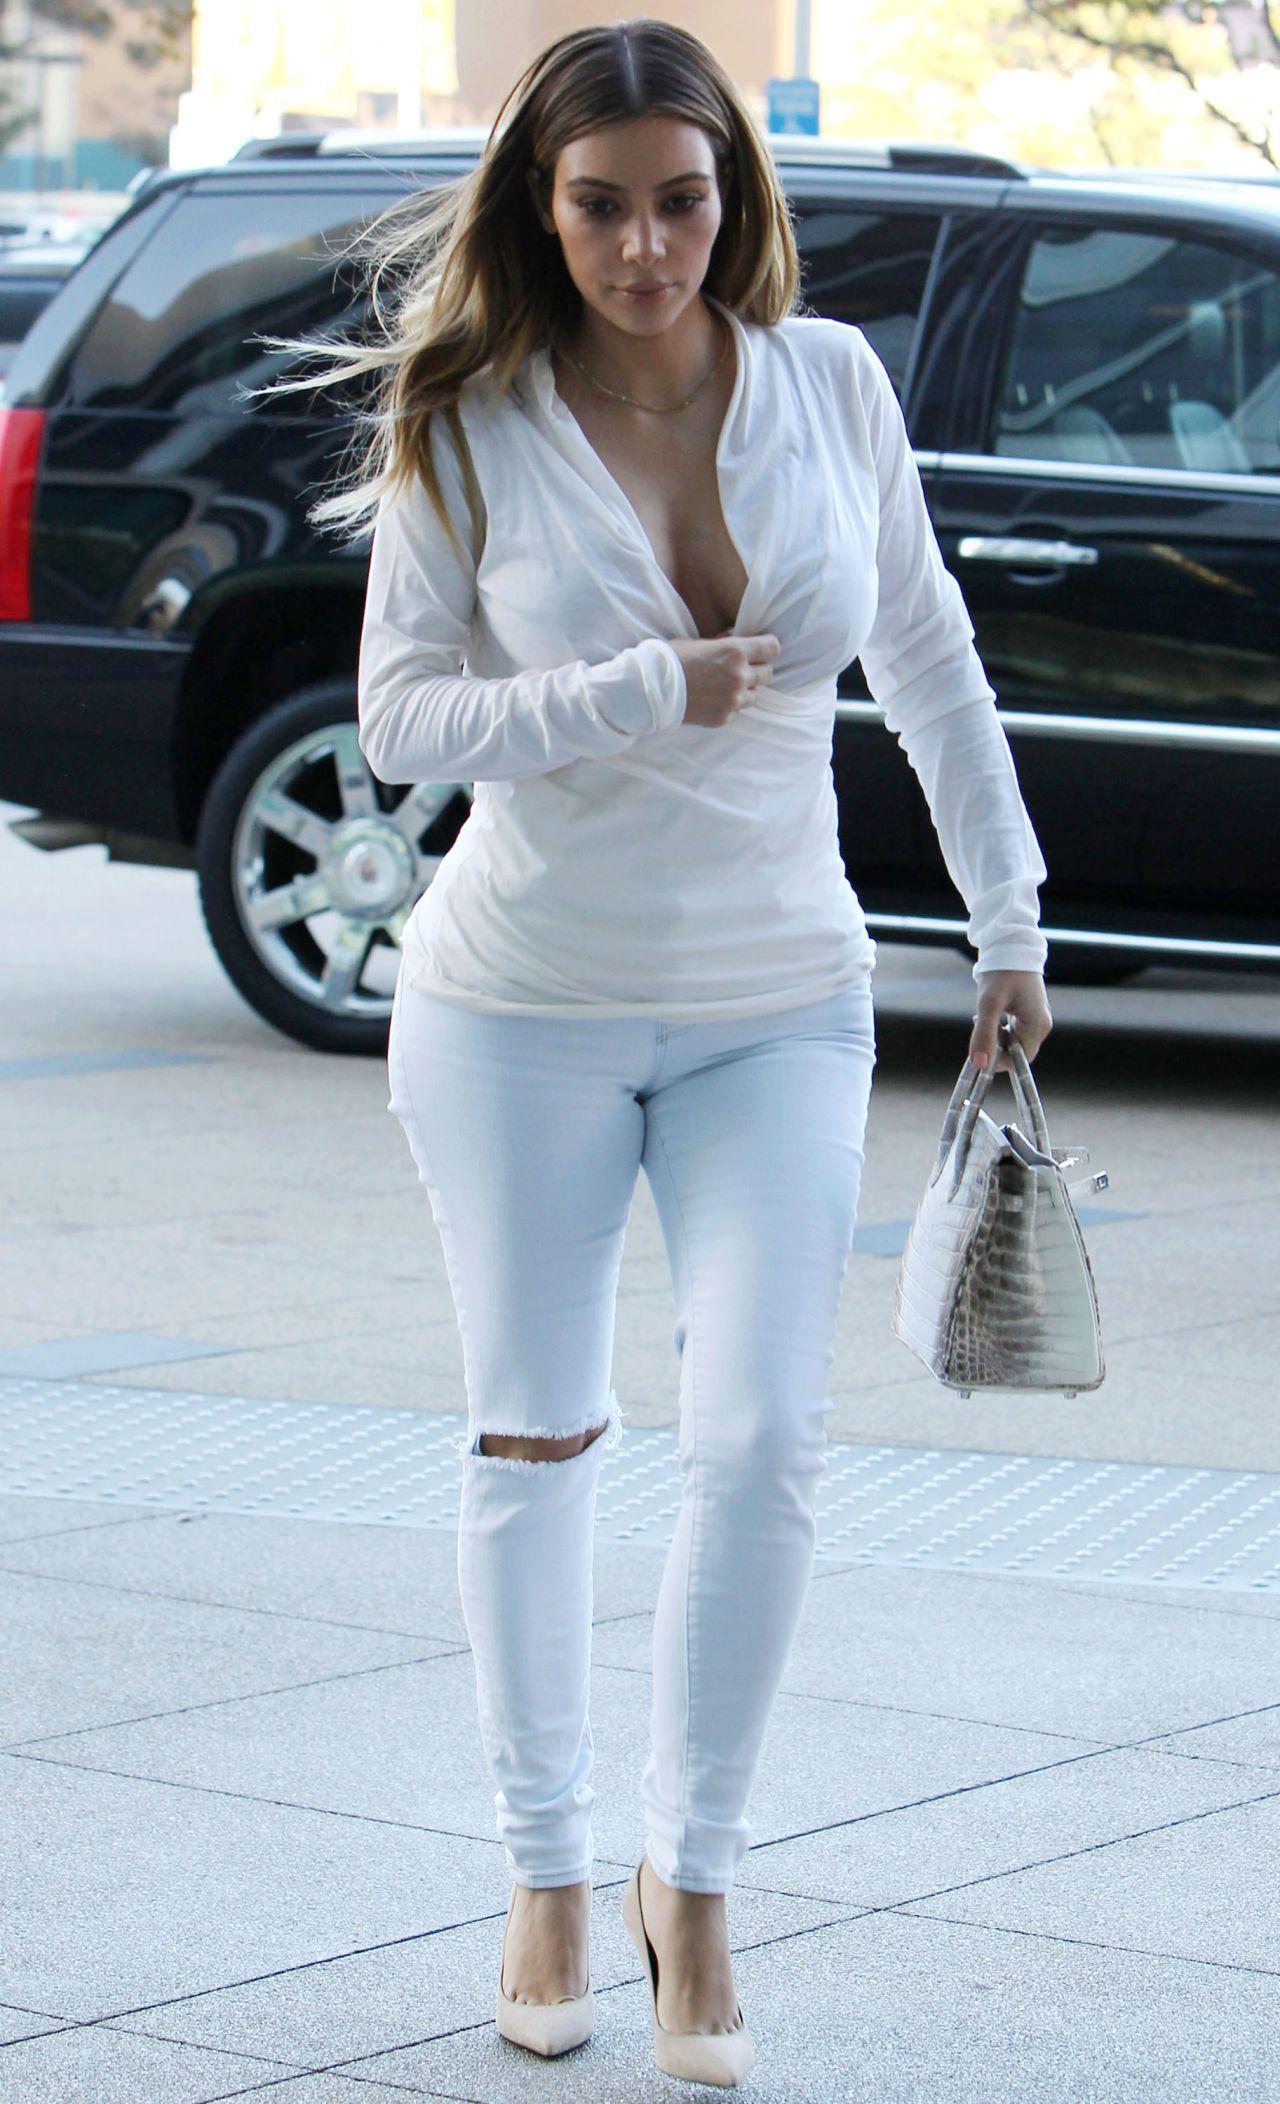 Kim Kardashian Best Street Style Moments | Kardashian, Street styles ...